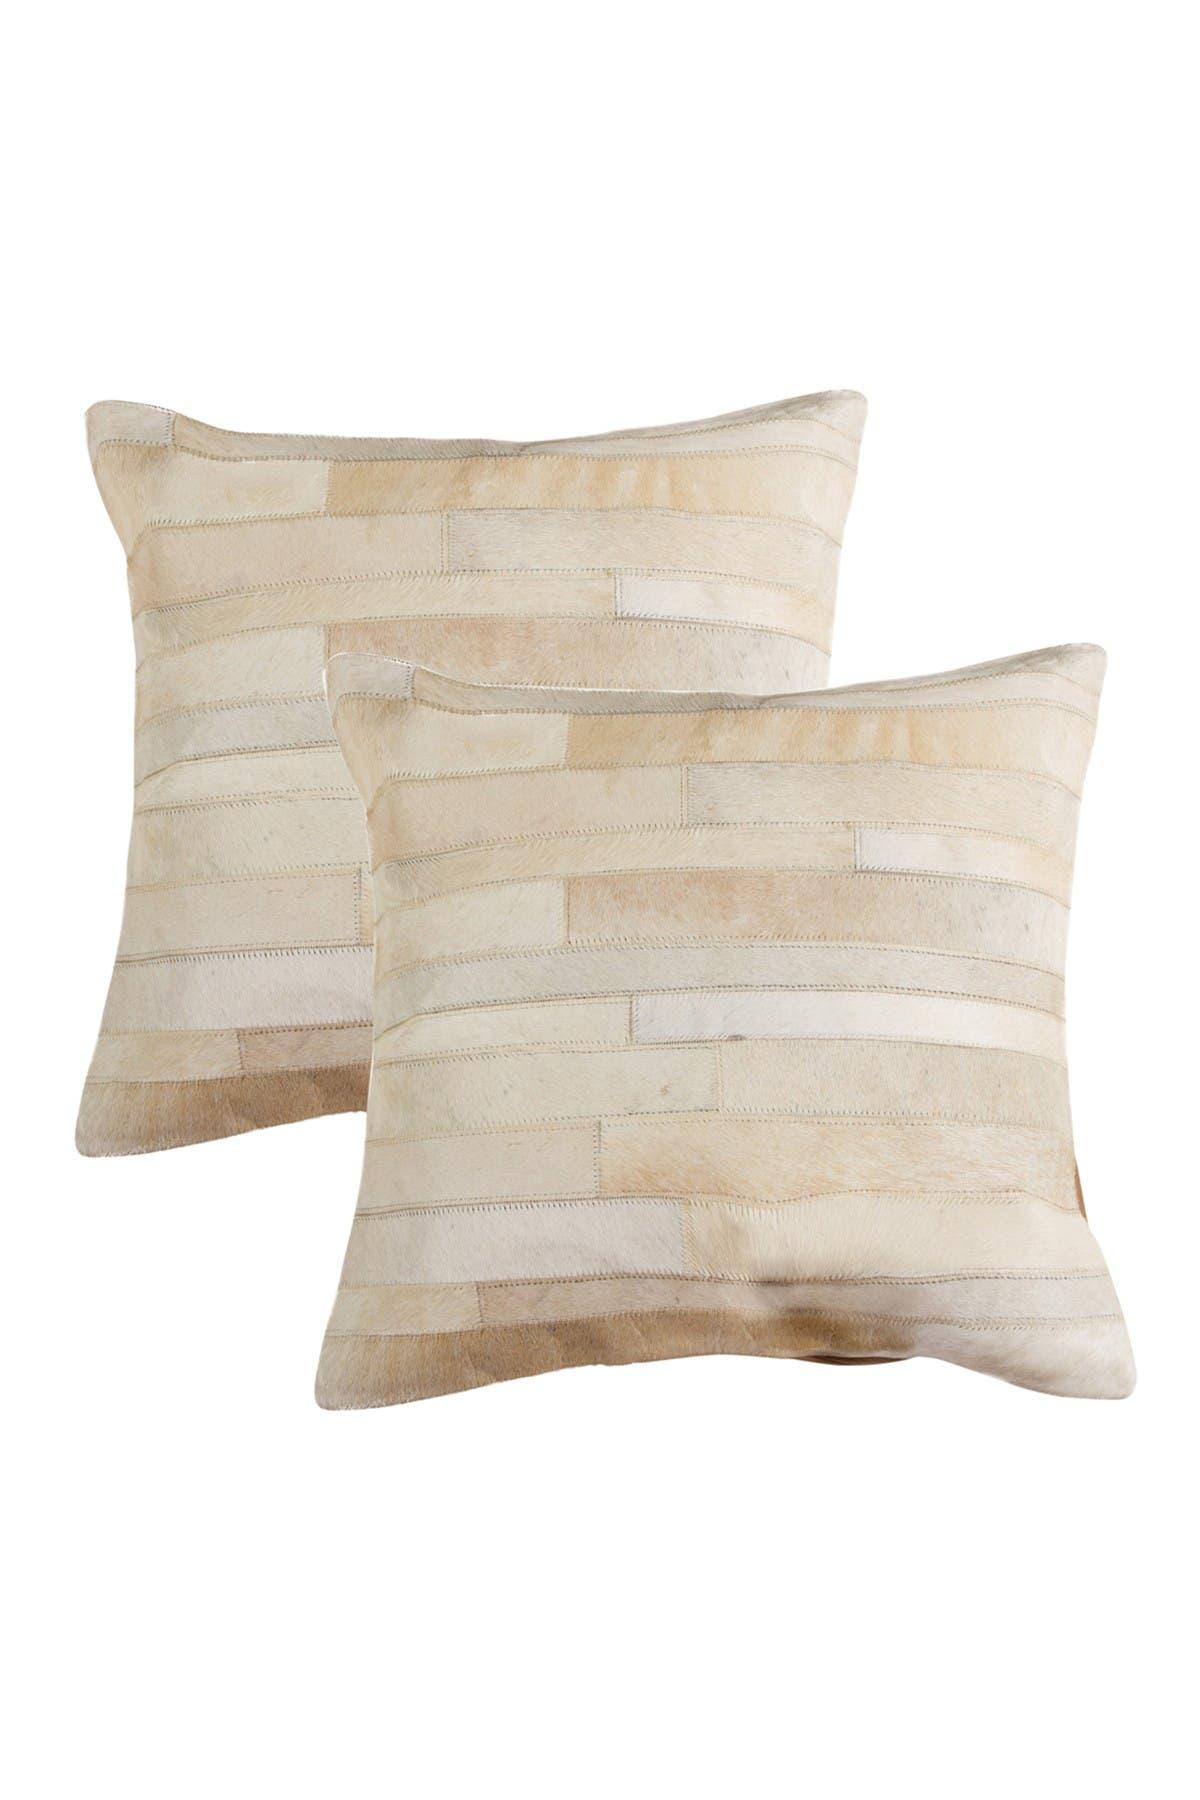 "Image of Natural Torino Madrid Pillow 18"" x 18"" - Natural - Pack of 2"